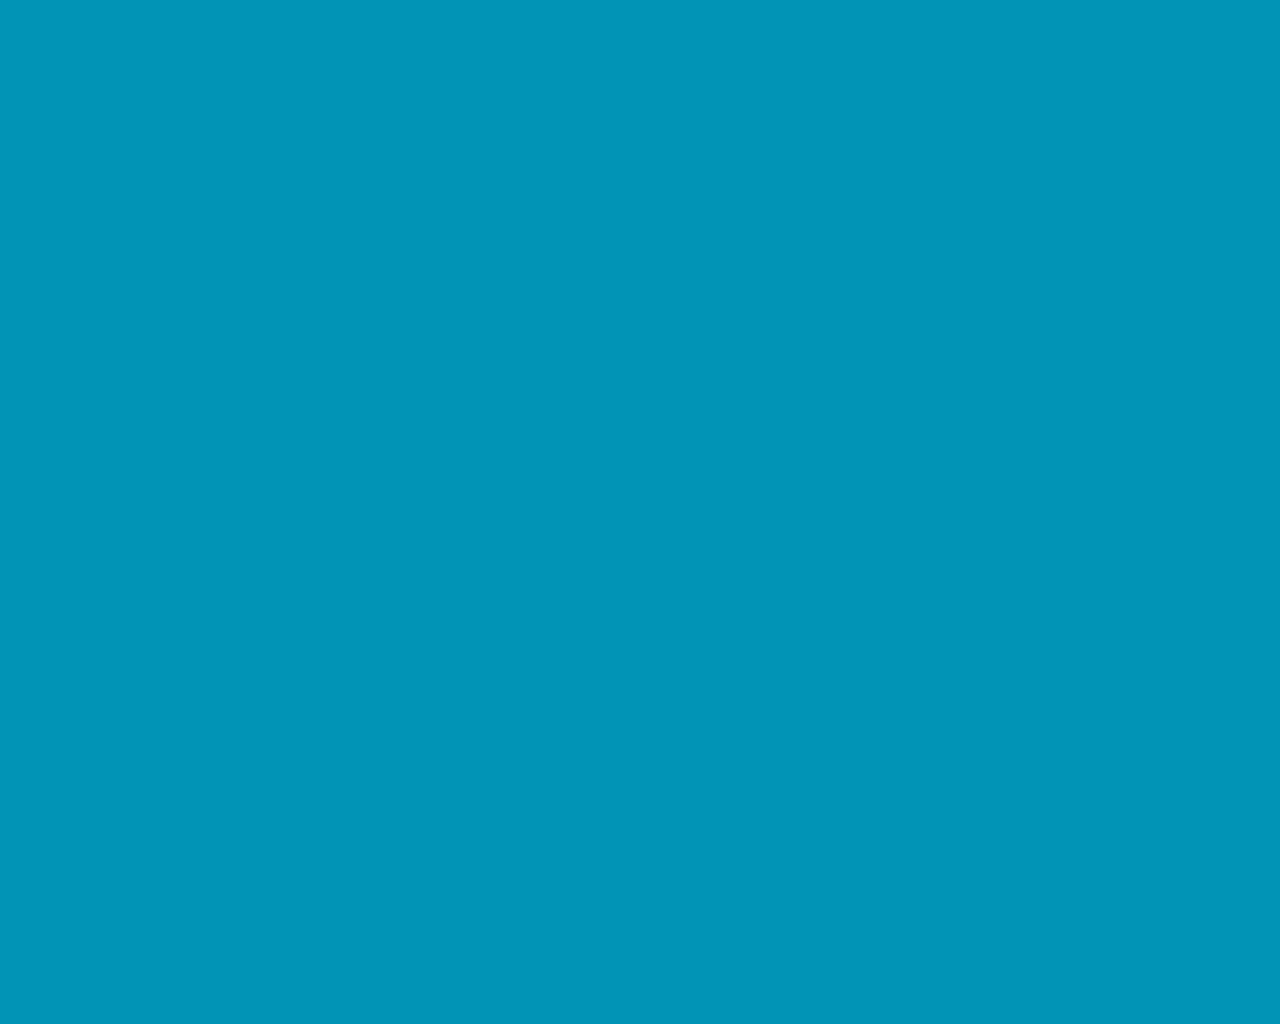 1280x1024 Bondi Blue Solid Color Background